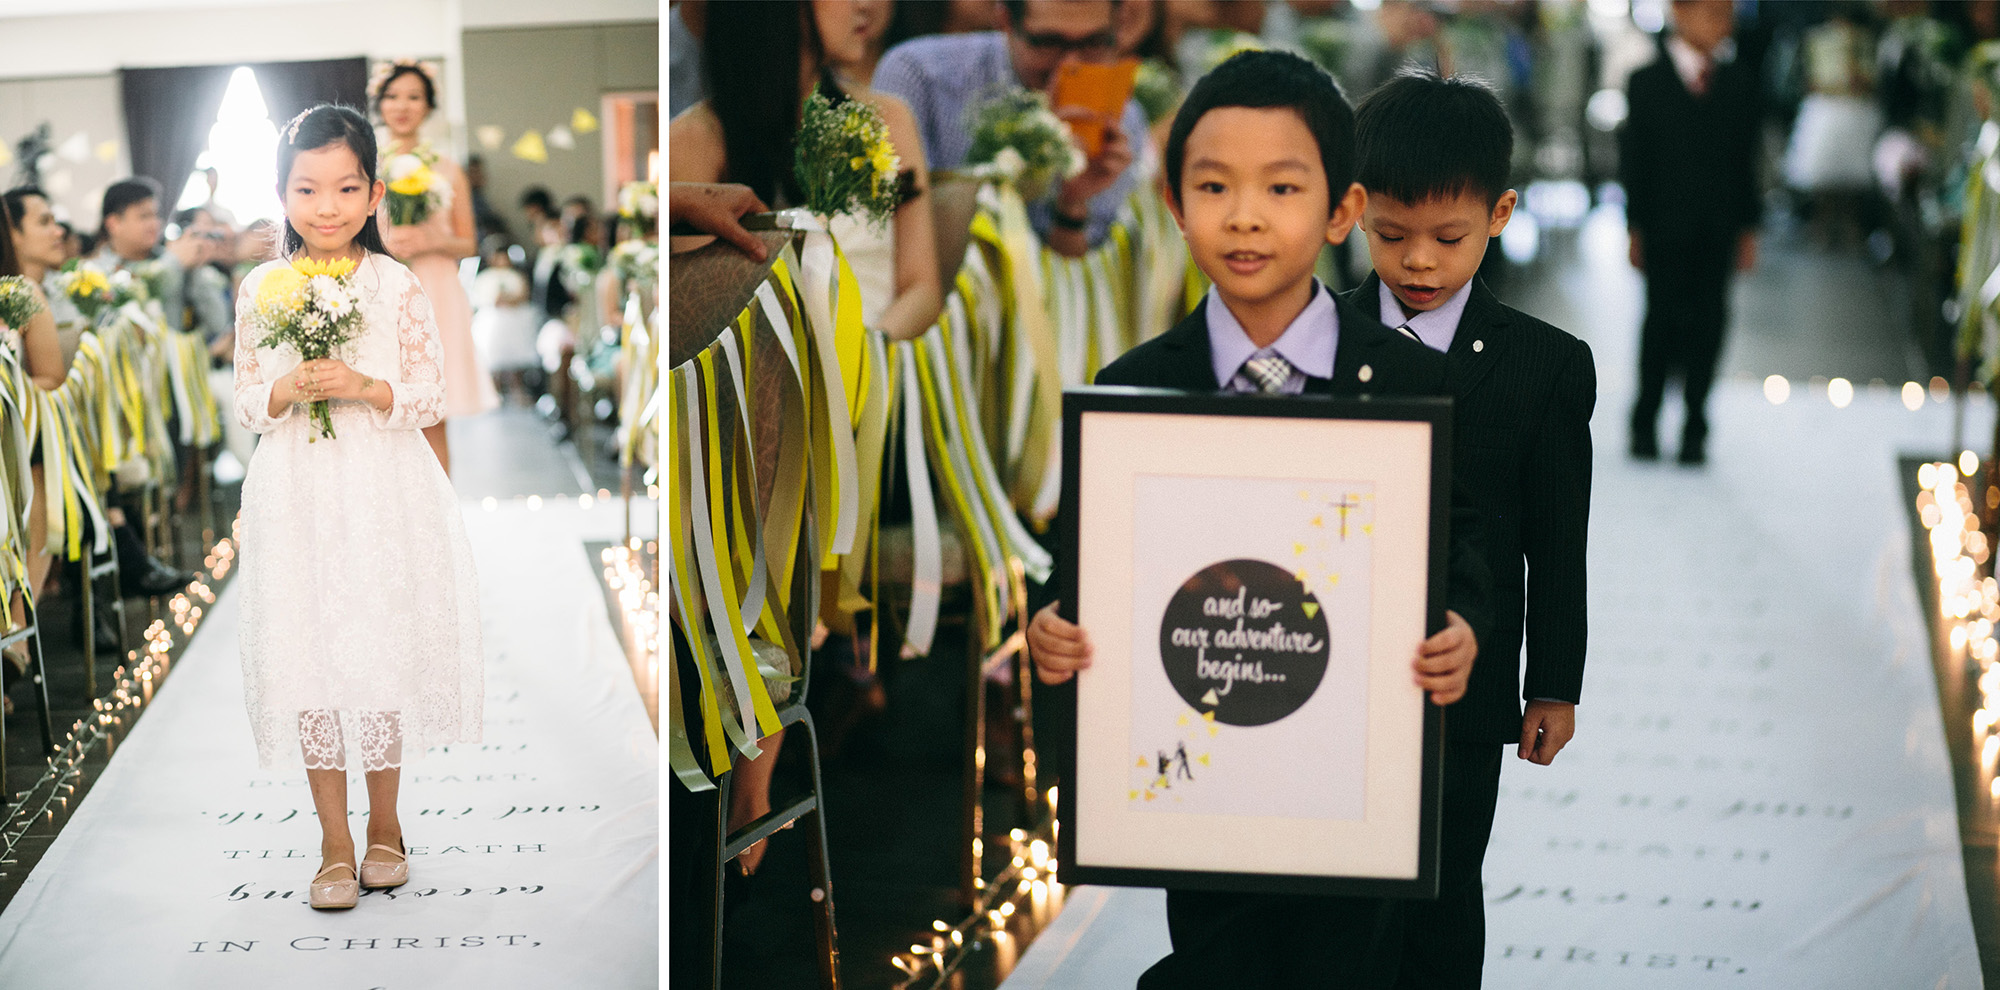 44-hellojanelee-sam grace-malaysia-wedding-day